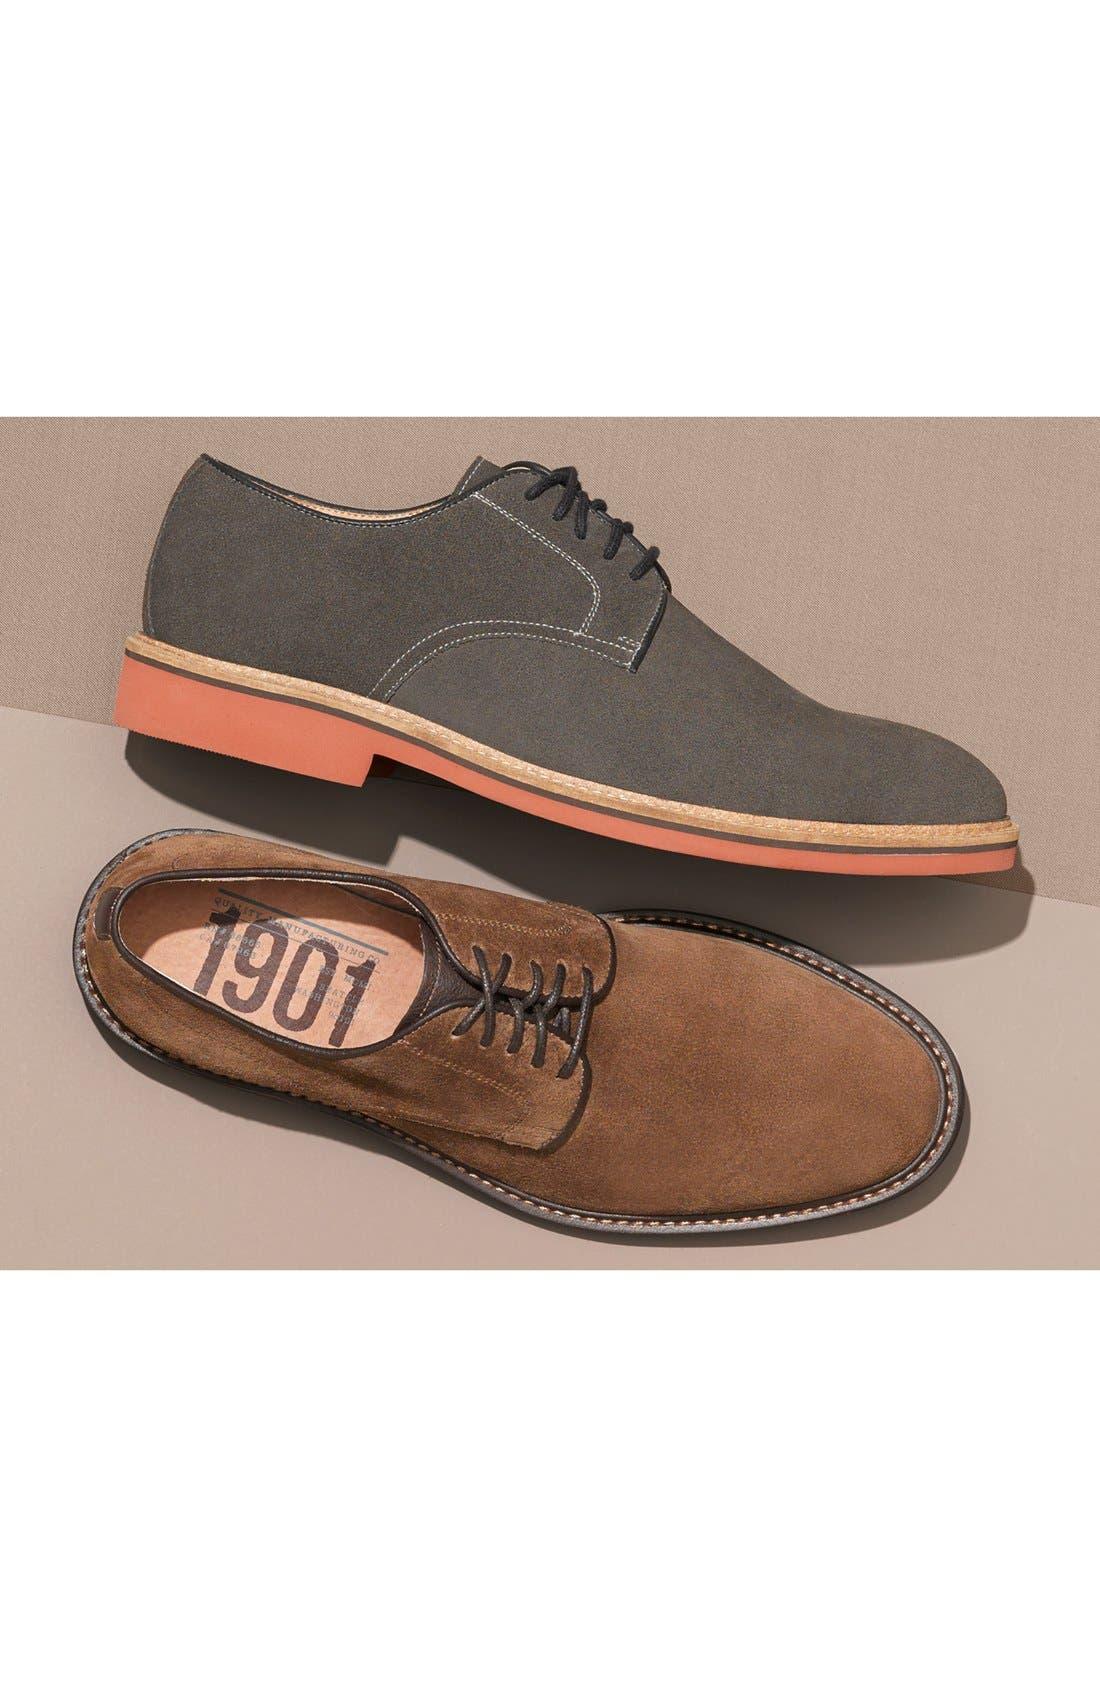 Byron Buck Shoe,                             Alternate thumbnail 6, color,                             020